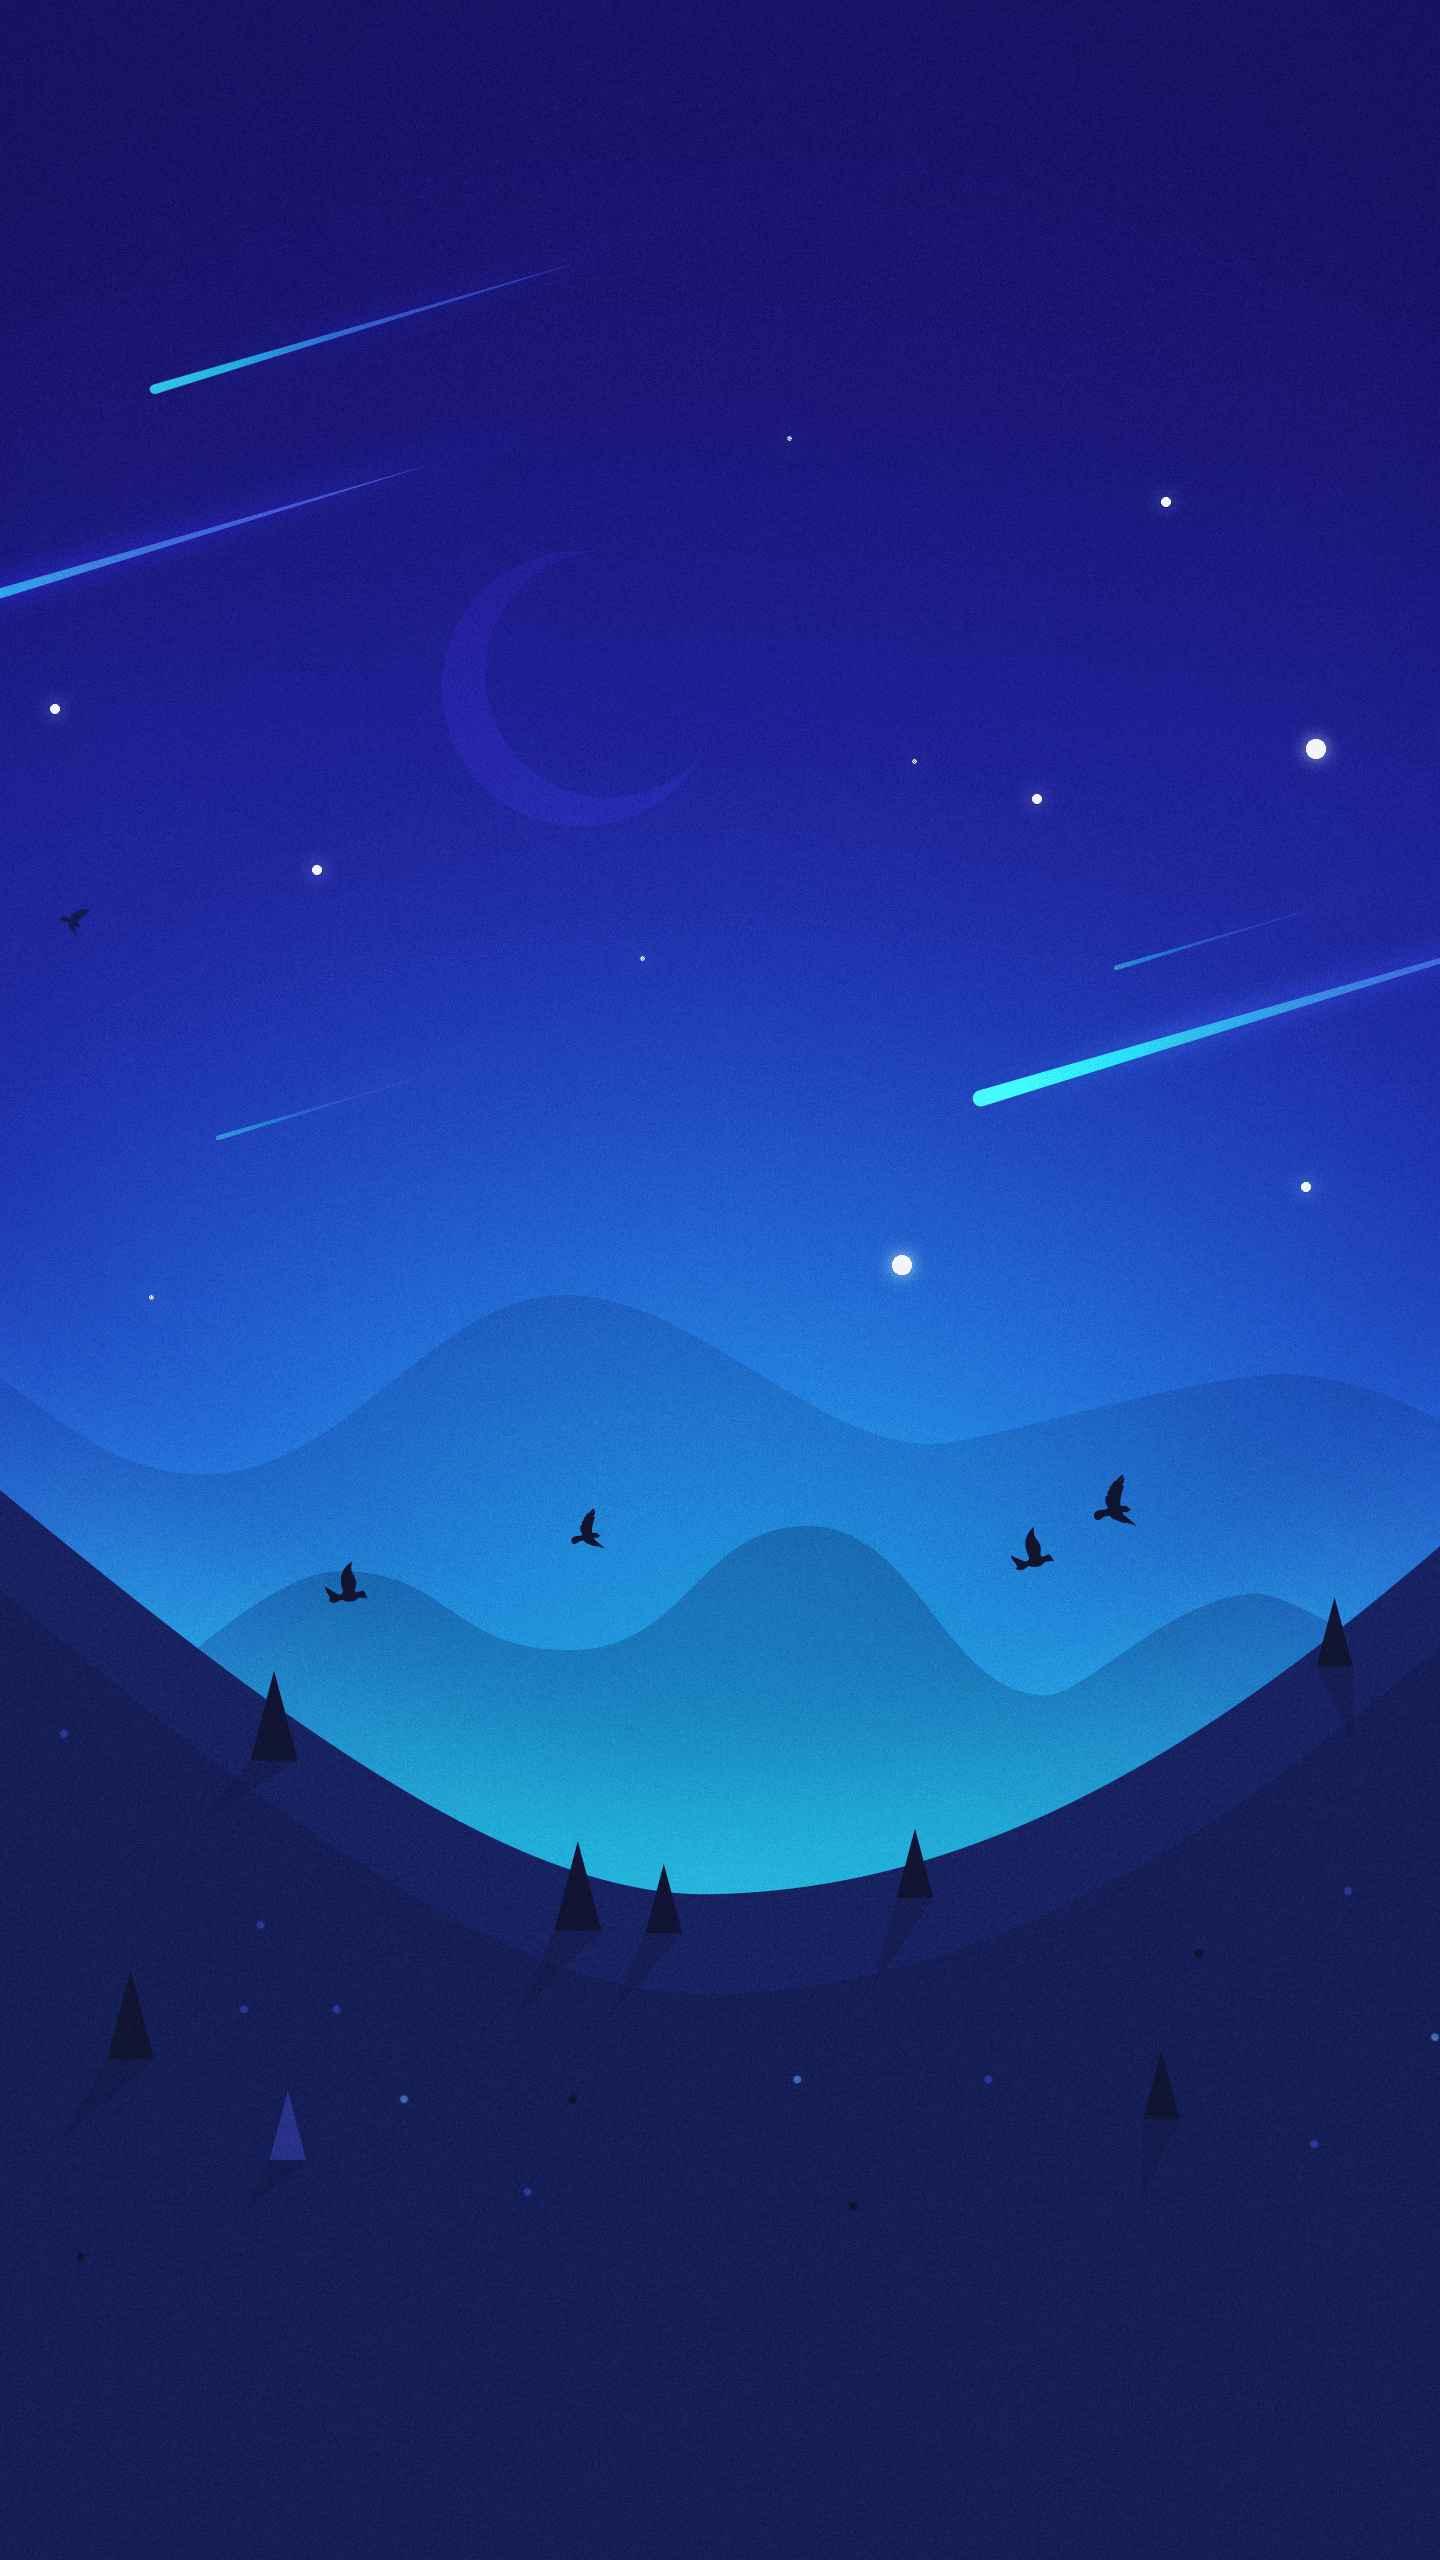 Star Field iPhone Wallpaper